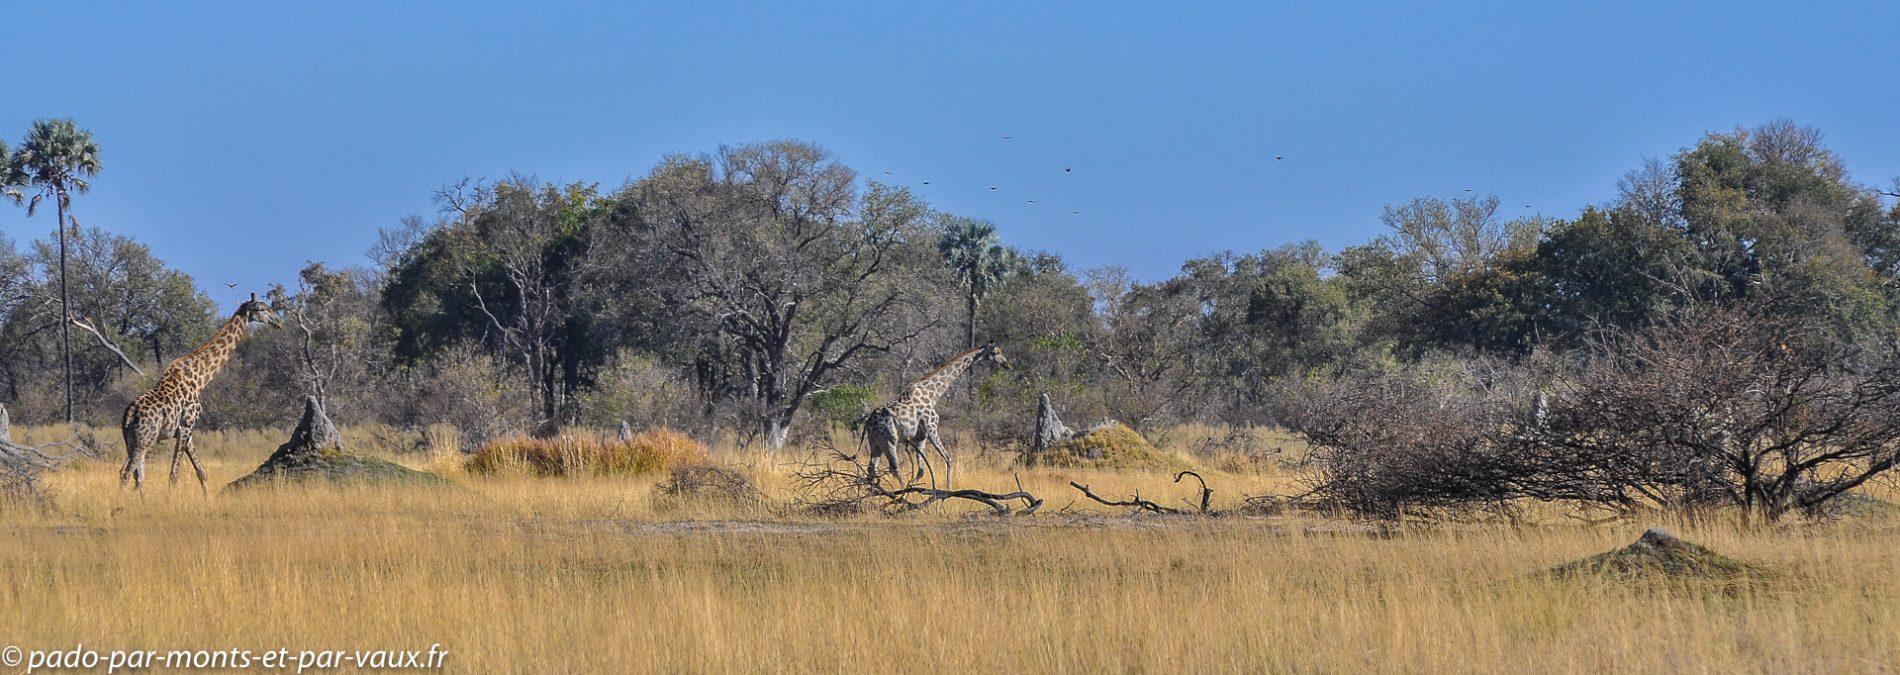 Gunn's camp - Girafes